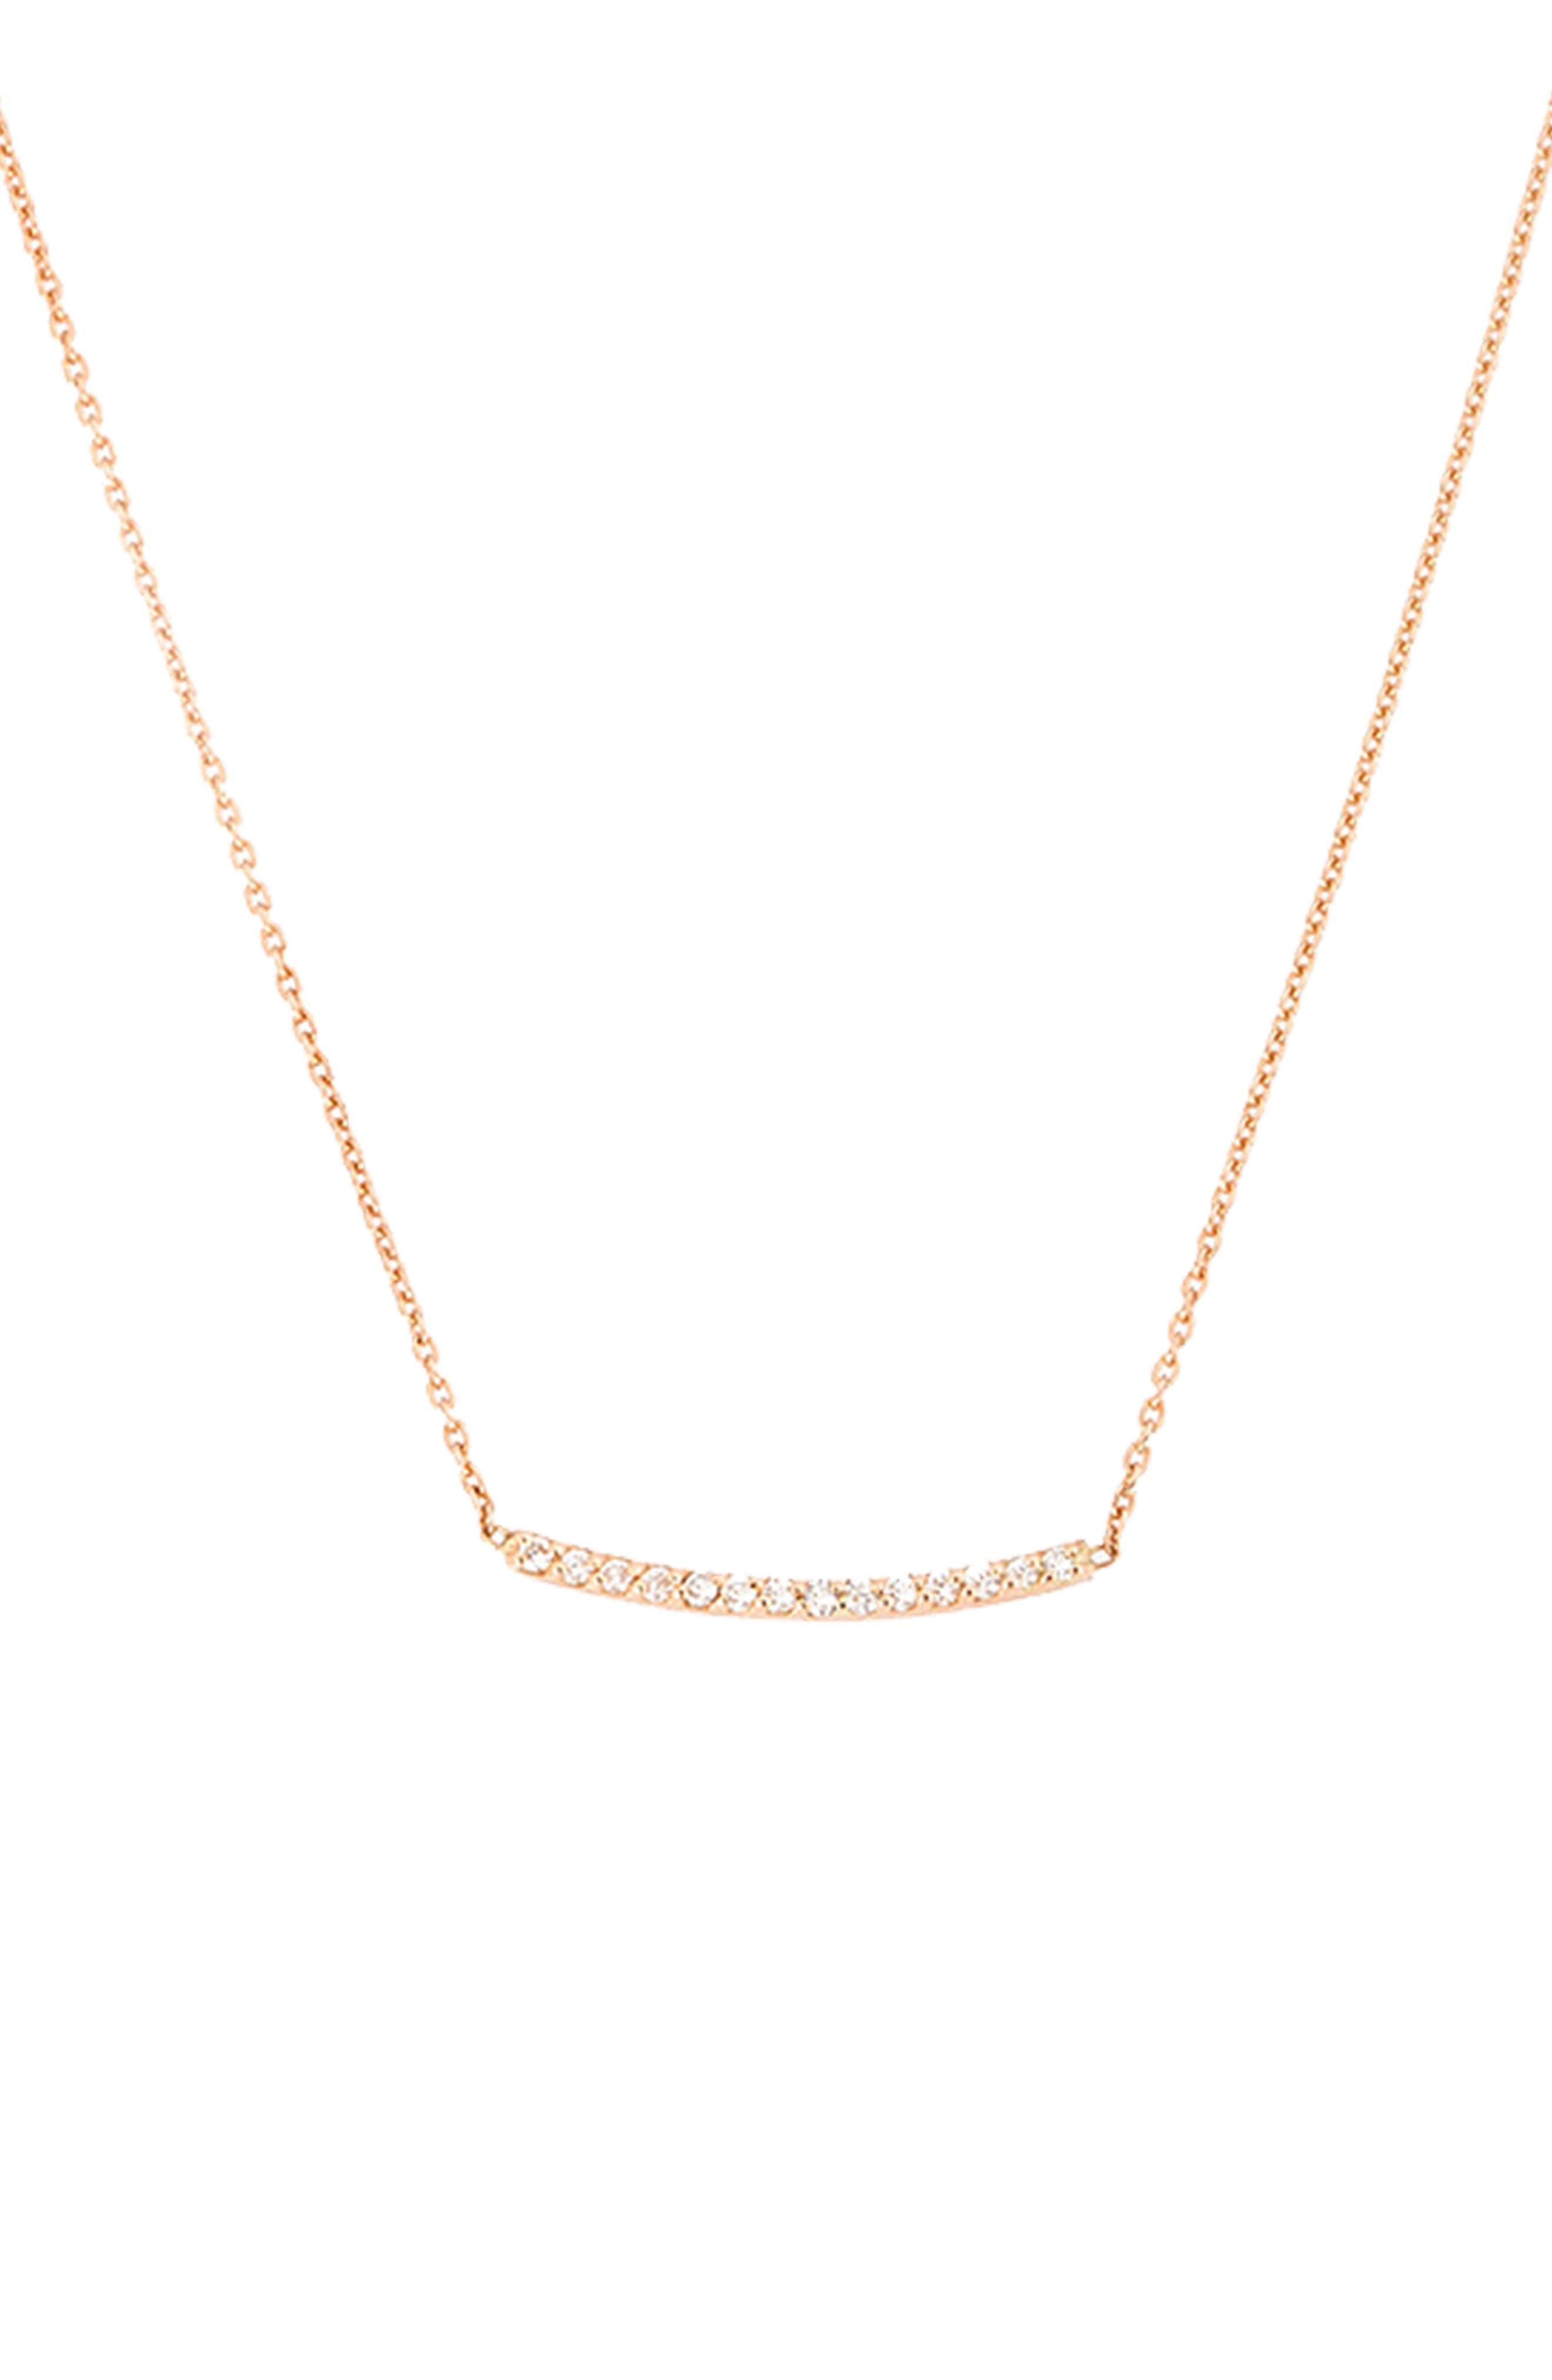 Main Image - Kismet by Milka Lumiere Diamond Bar Necklace